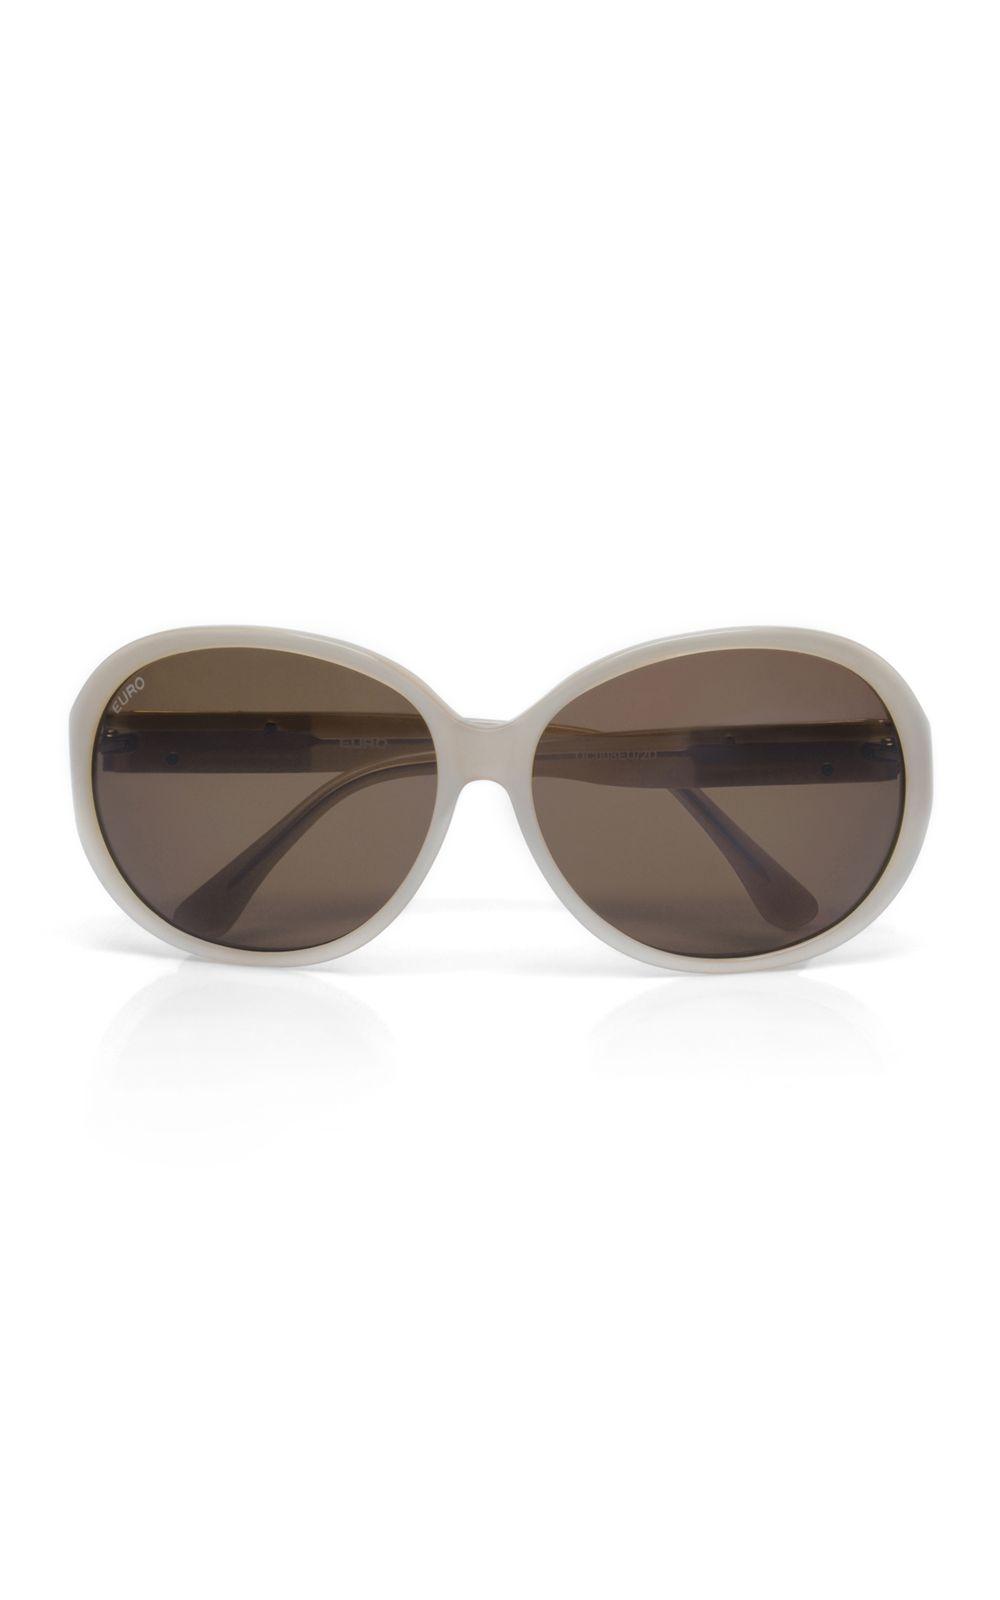 9bf37439e Óculos sol Euro Feminino Genova Branco Perolado OC008EU/2D. undefined